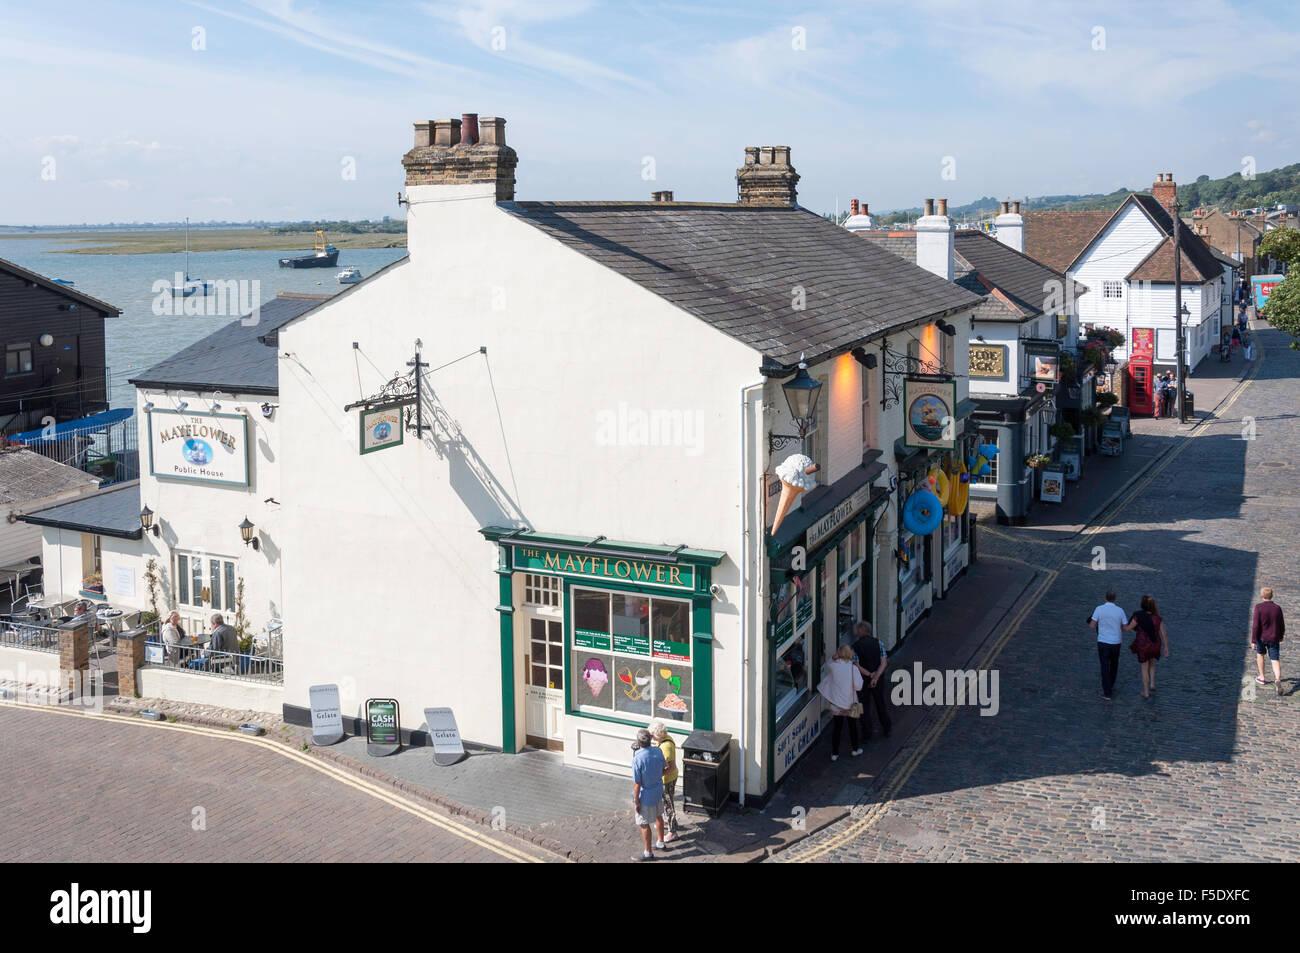 The Mayflower Pub, High Street, Old Leigh, Leigh-on-Sea, Essex, England, United Kingdom - Stock Image